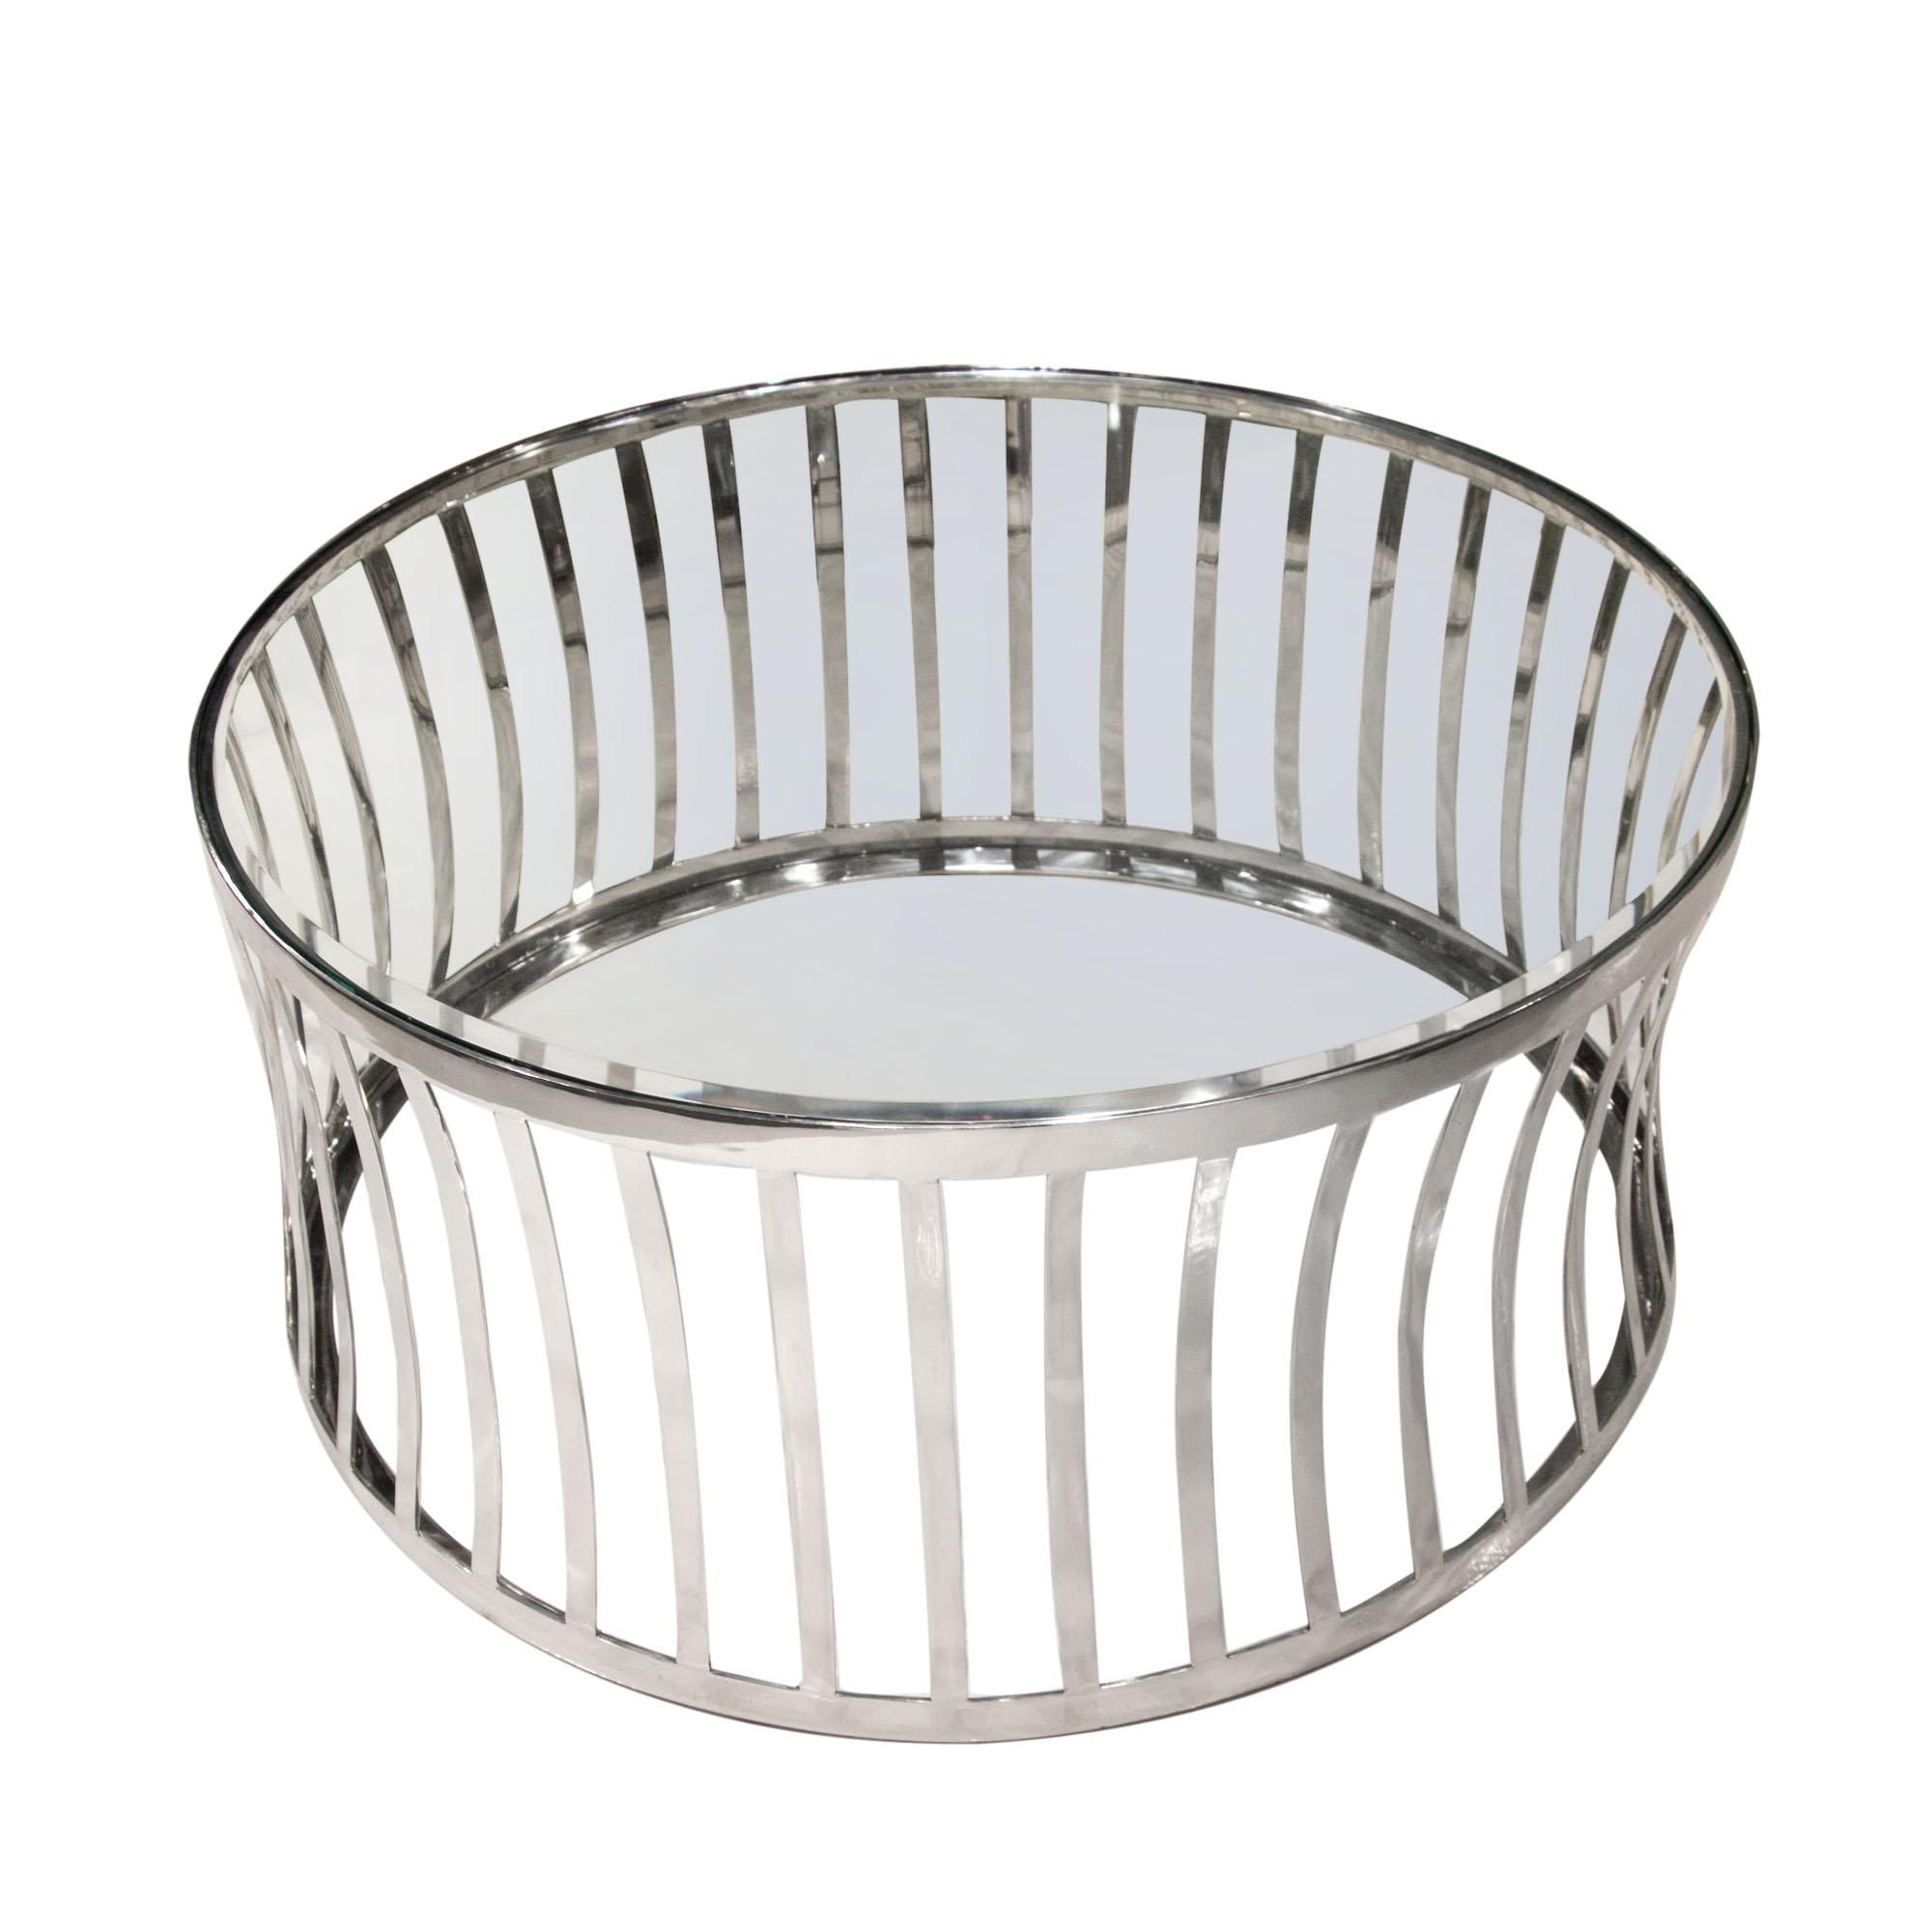 Diamond Sofa Capri Round Stainless Steel Cocktail Table - Item Number: CAPRICTST